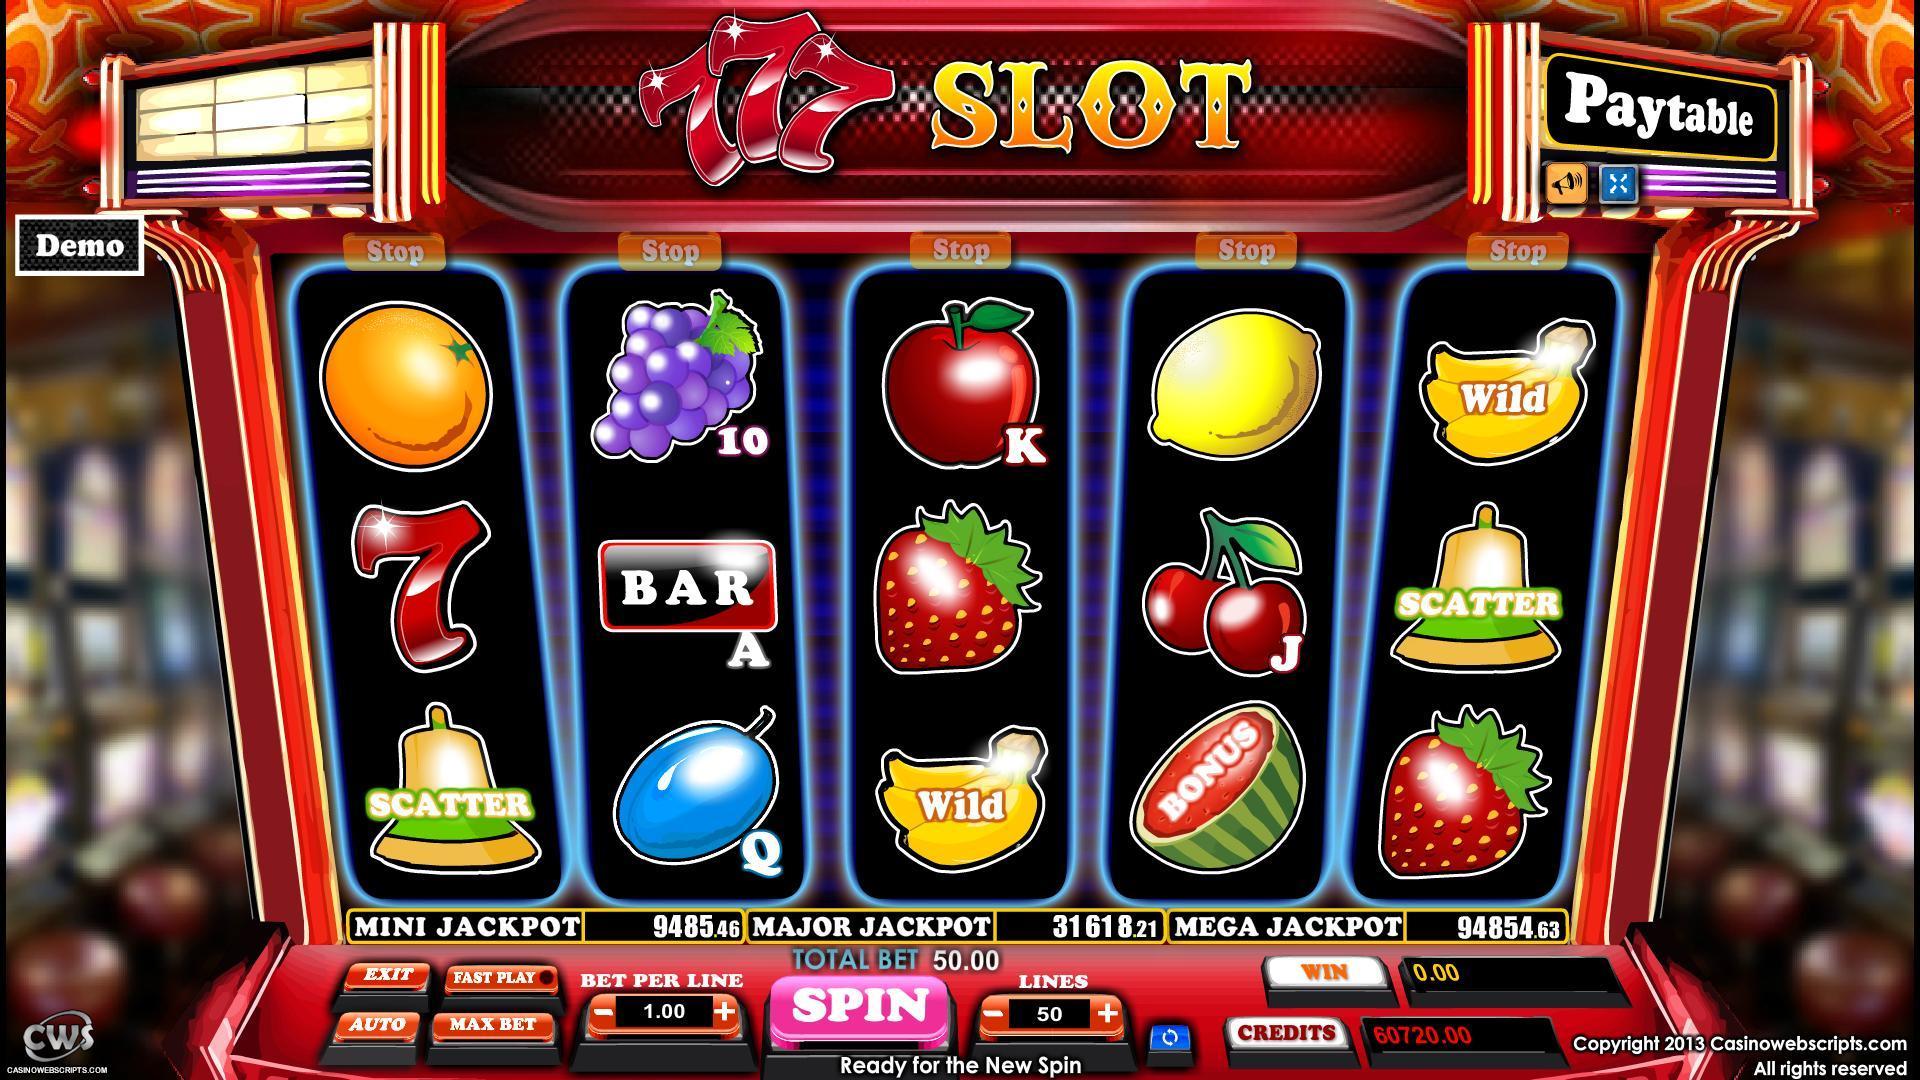 Live Video Poker Game, Bonus Casino Game Play Online